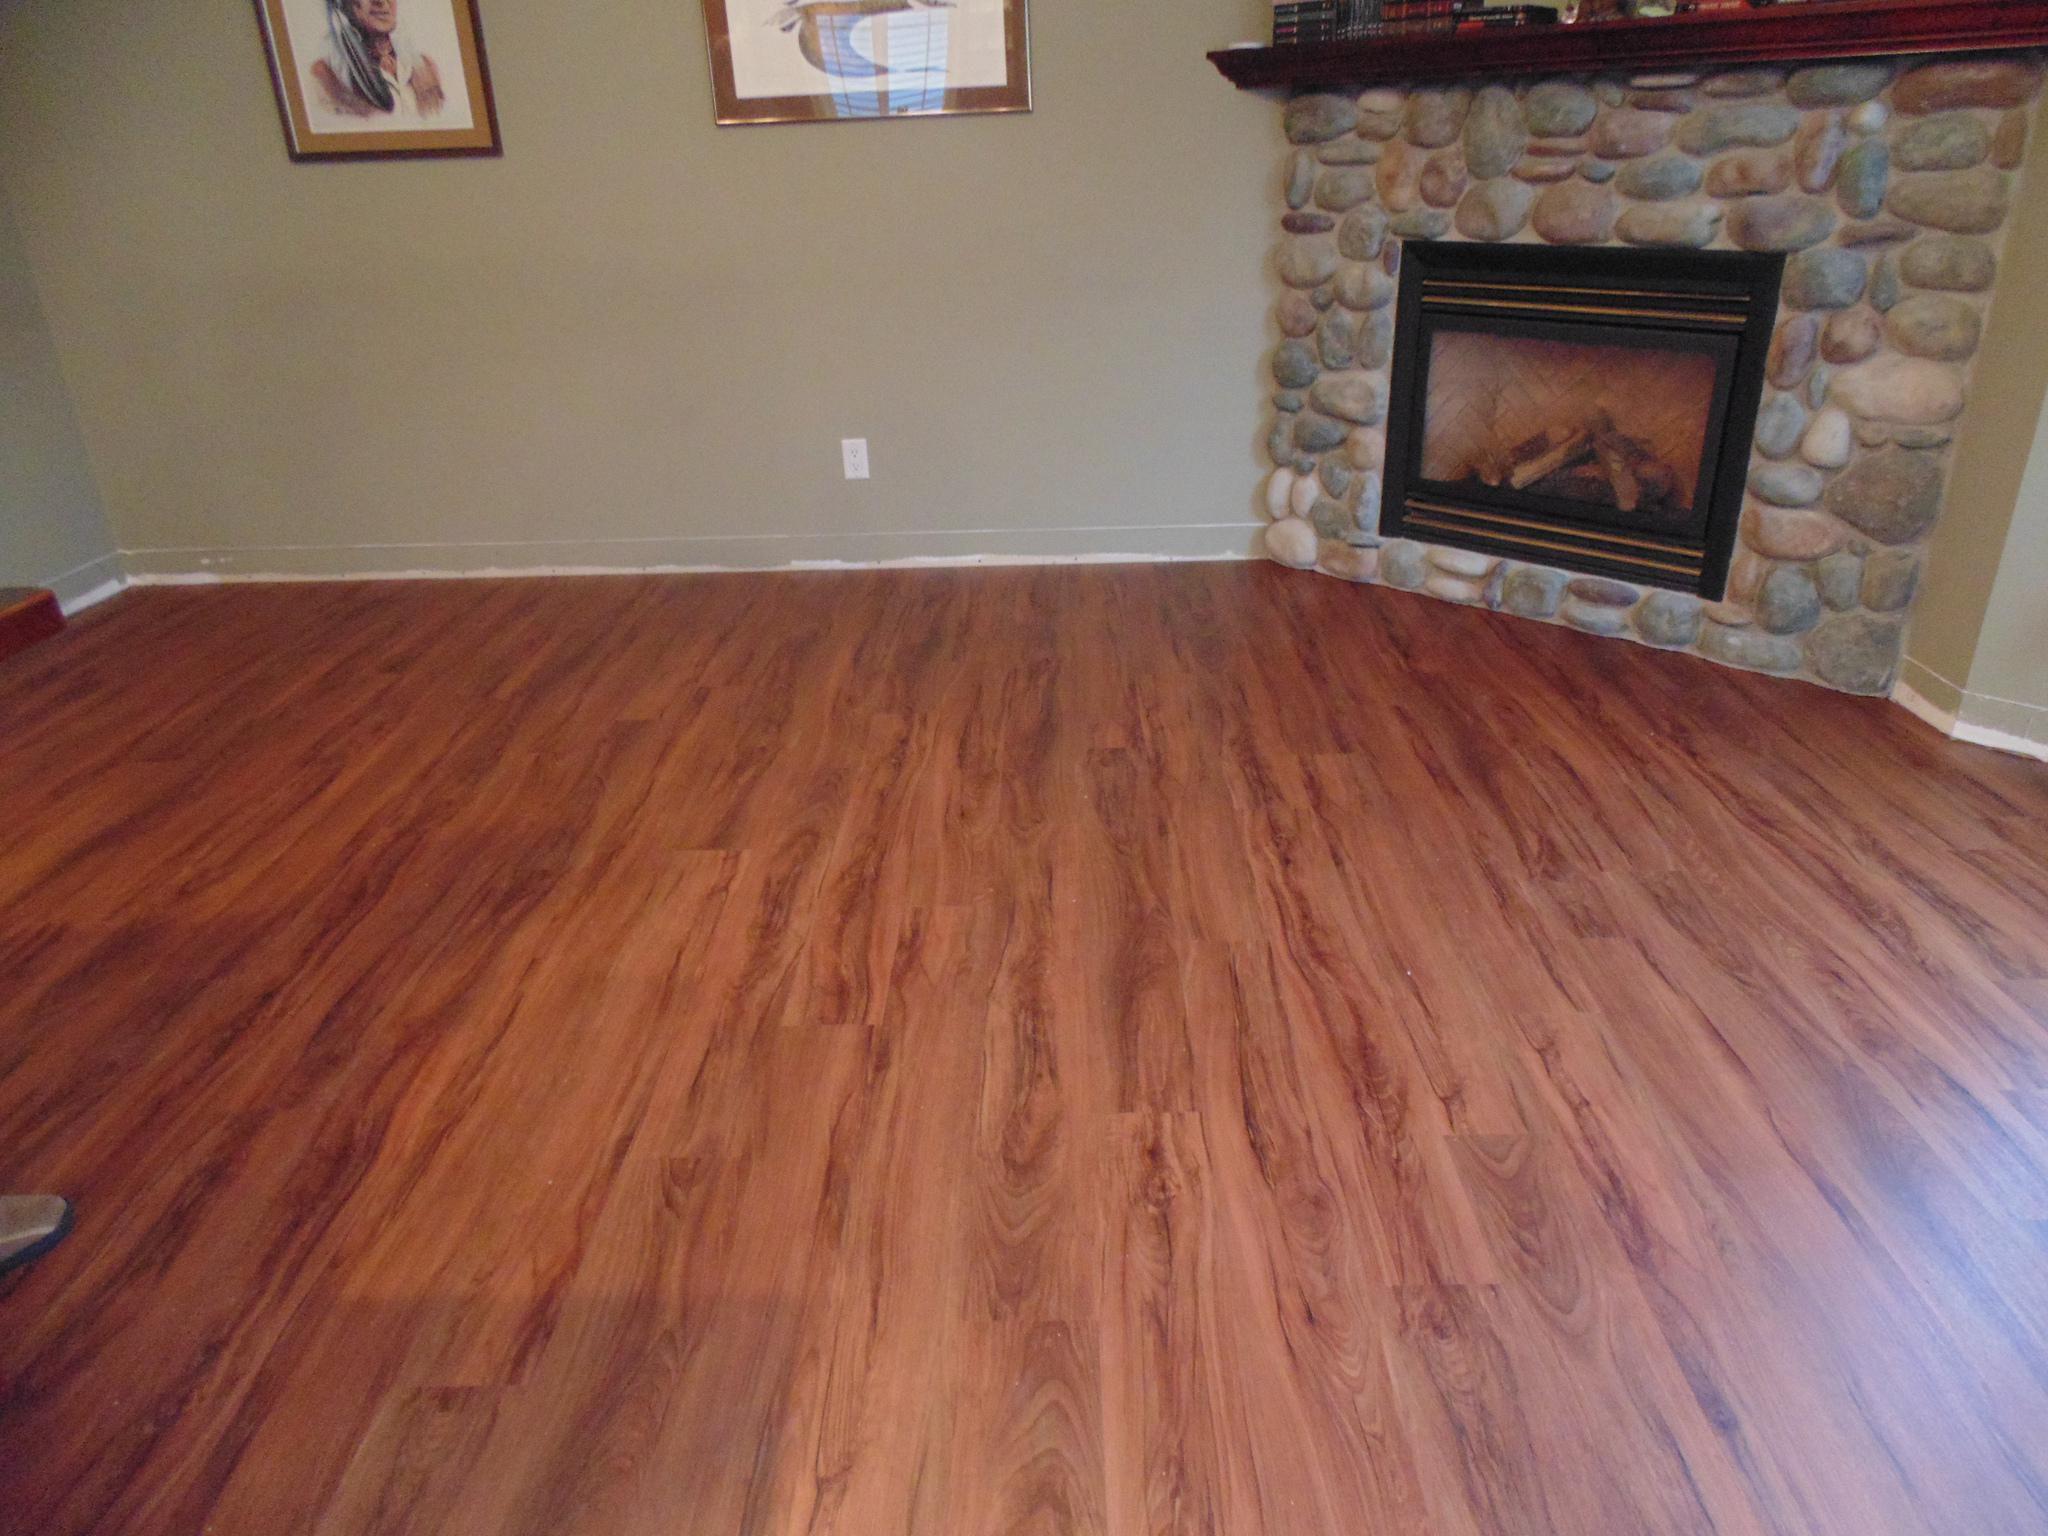 16 Fantastic Ct Hardwood Flooring Llc 2021 free download ct hardwood flooring llc of installing allure vinyl plank flooring regarding 11330786105 d09855f234 k 56a4a2965f9b58b7d0d7ef13